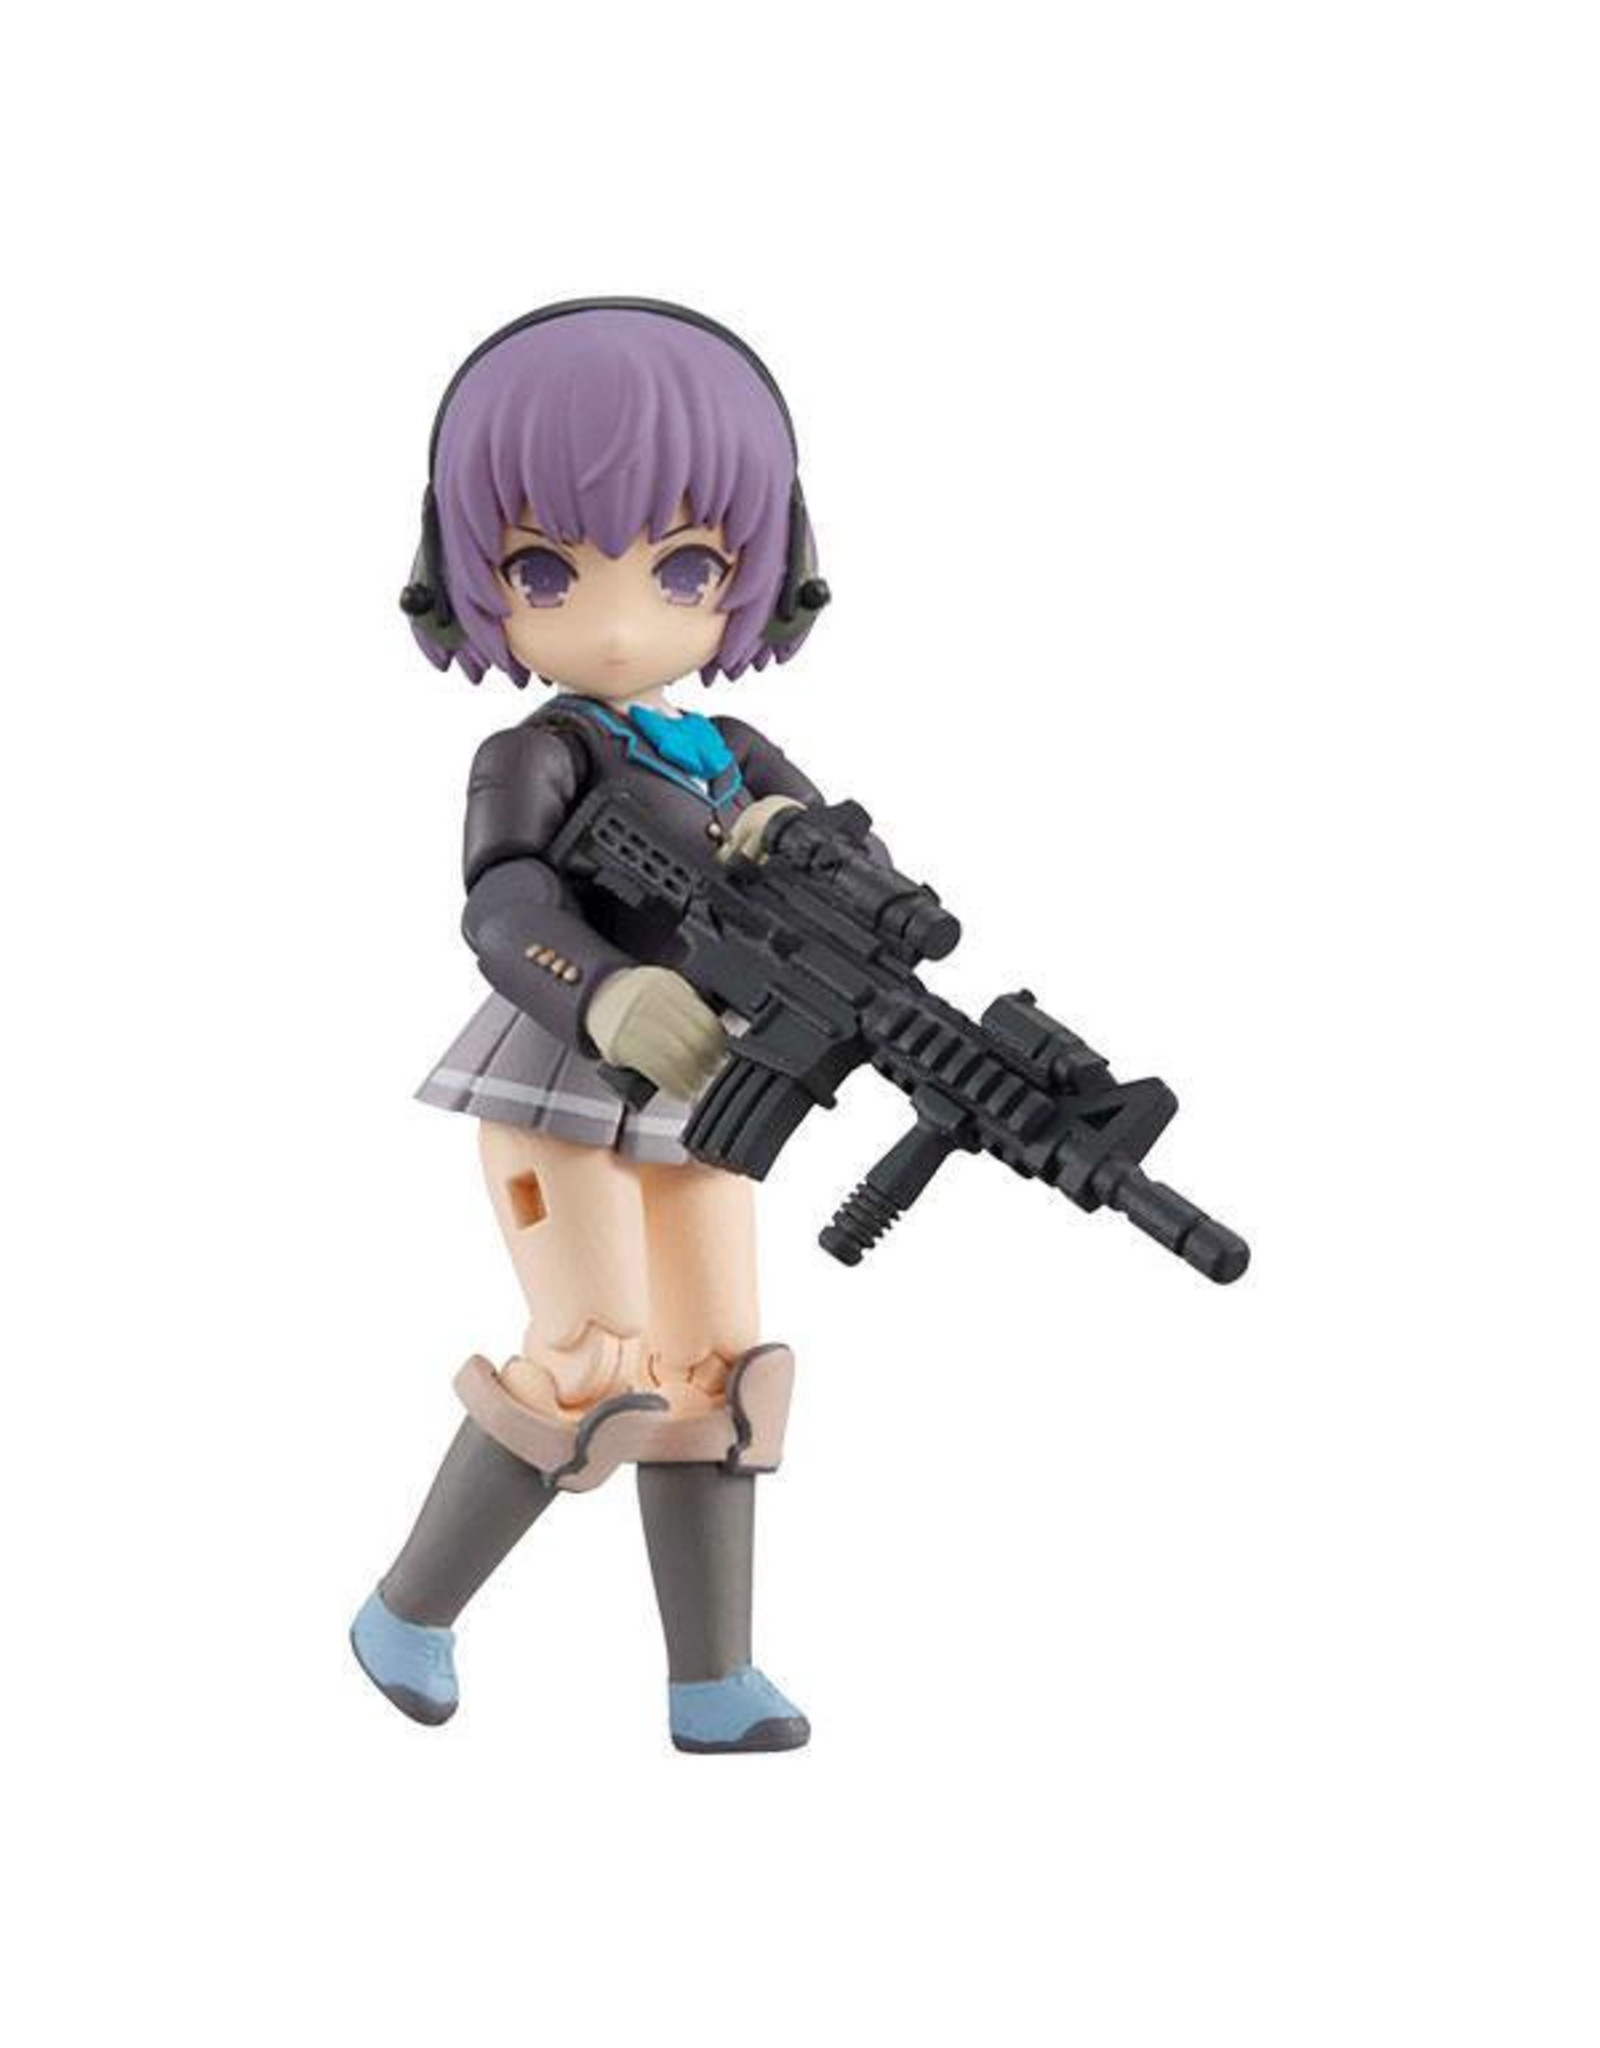 Little Armory Desktop Army Figures - 8 cm - Assortment Vol. 1 - Blind Box